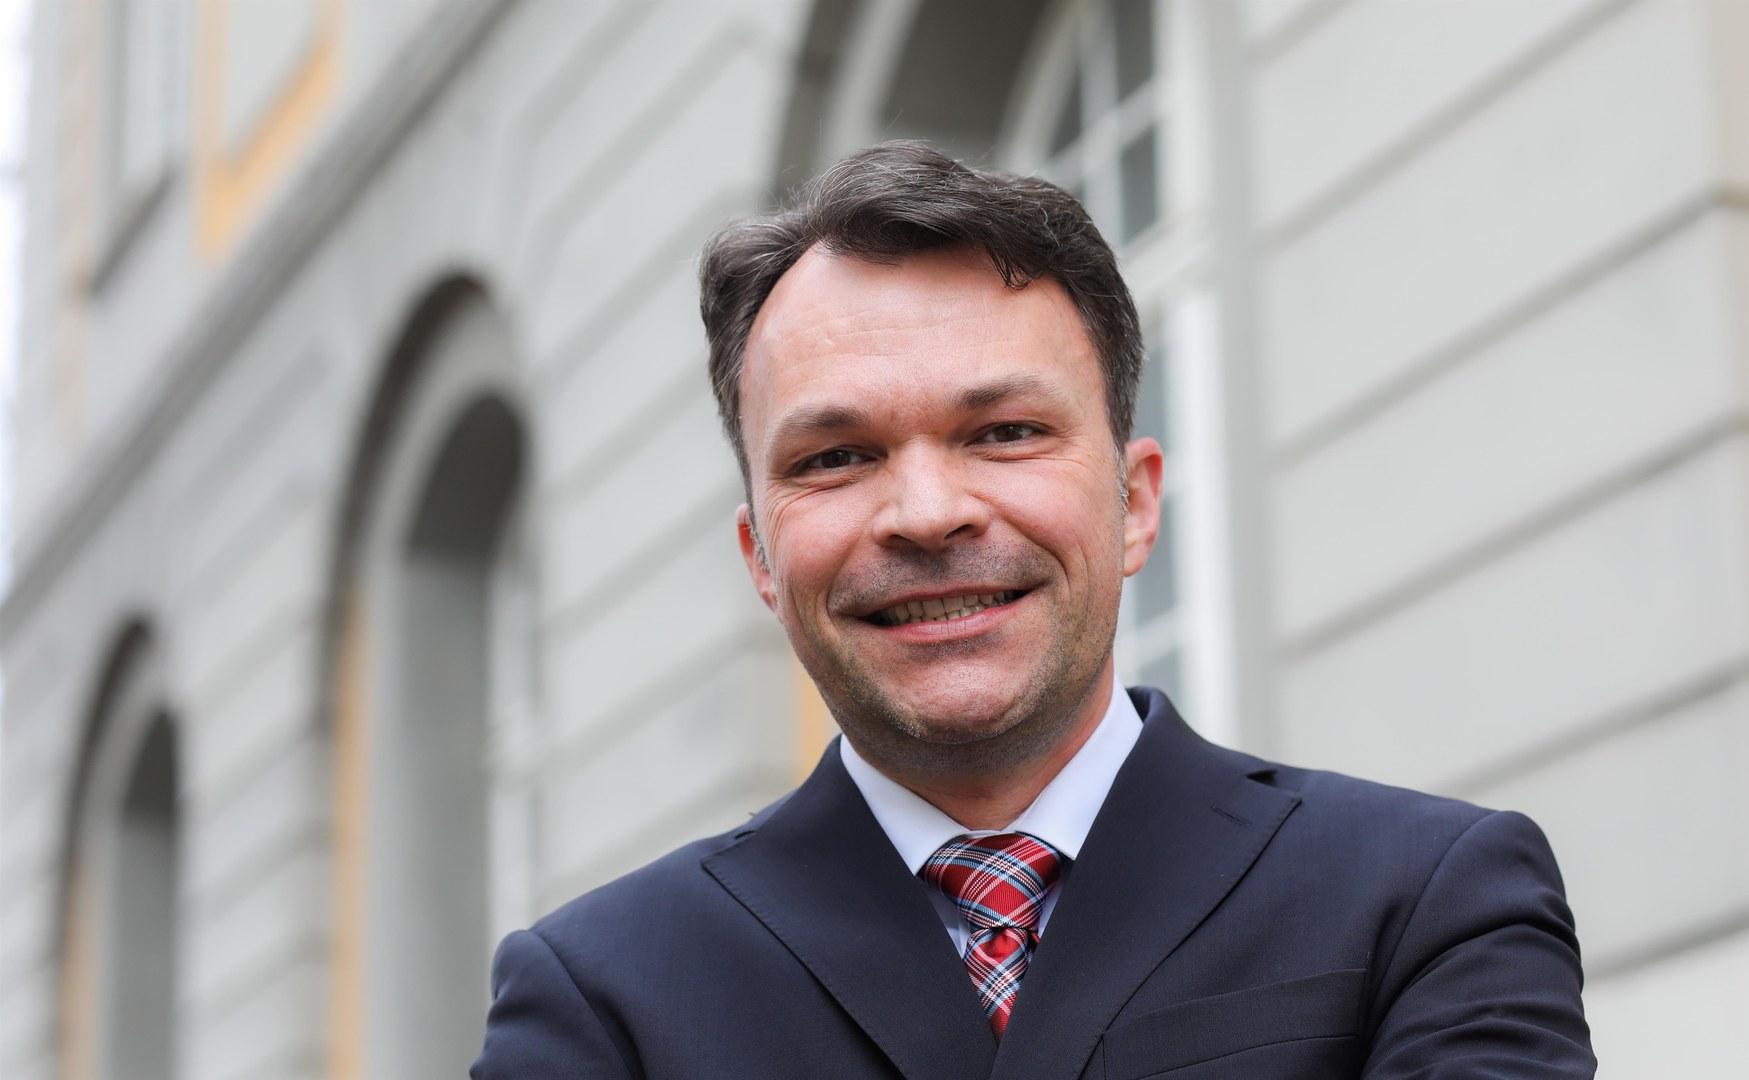 Prof. Dr. Matthias Weller